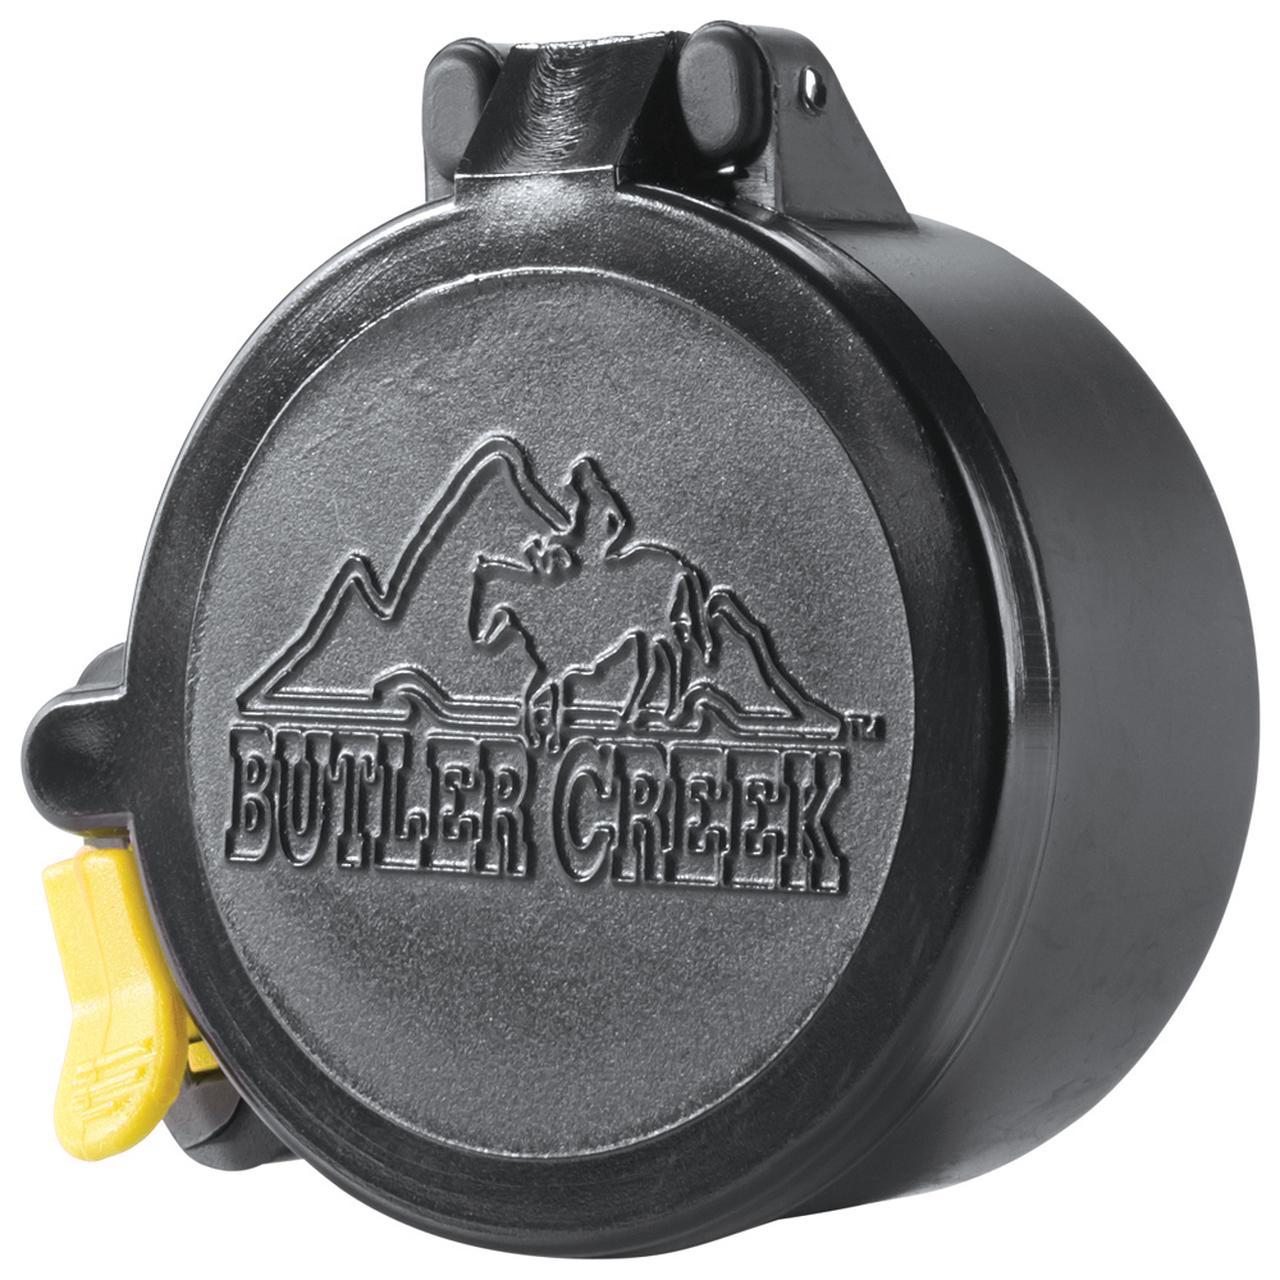 Butler Creek Multi-Flex Flip Open Scope Cover Eyepiece Size 10-11